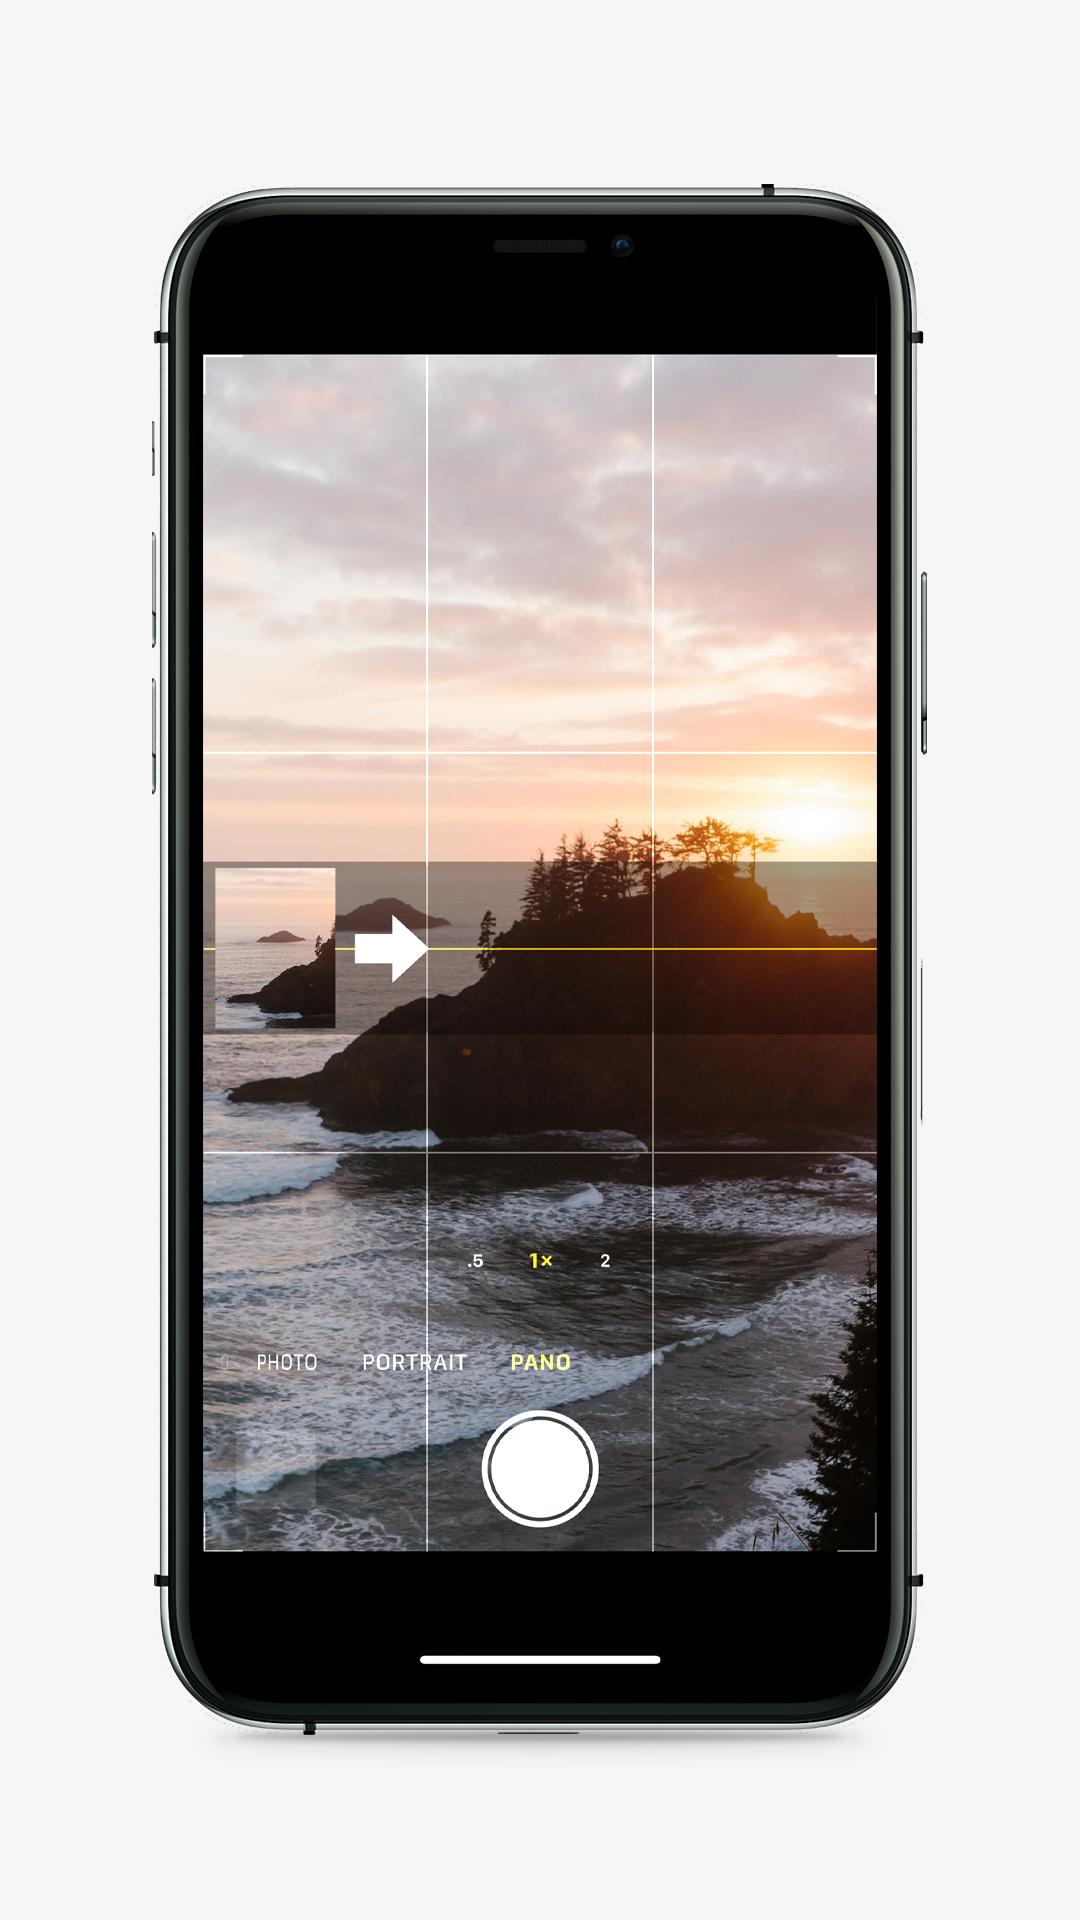 IPhone Pano Mode